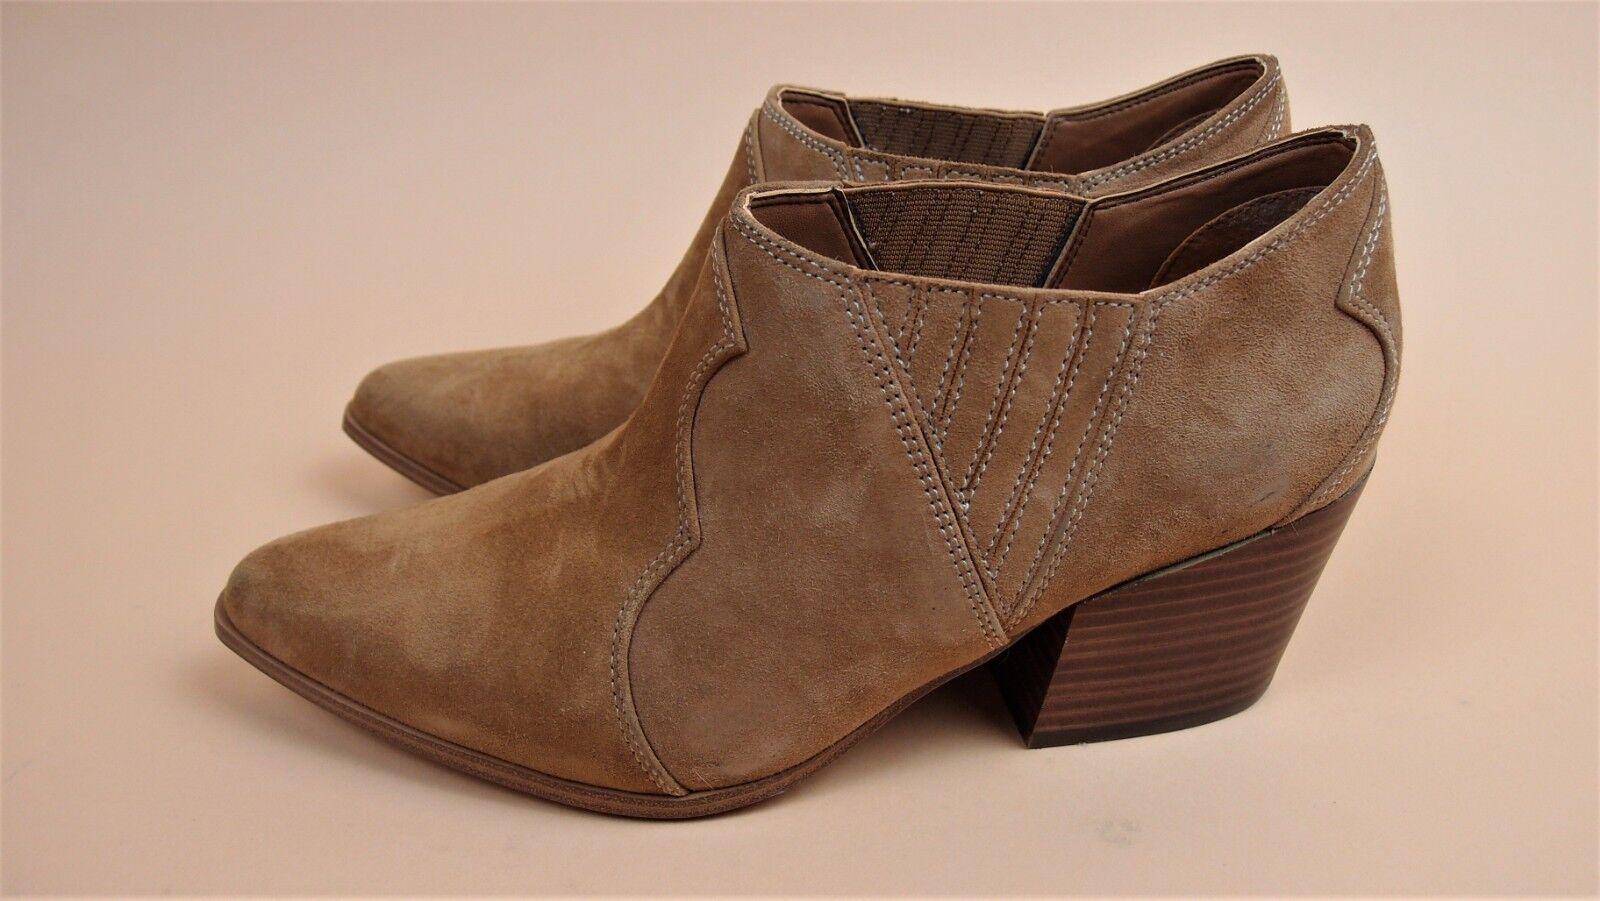 Aldo Véritable Daim tan Bas Cowboy Cubain pointu à talon chaussures UK 8 BNWB